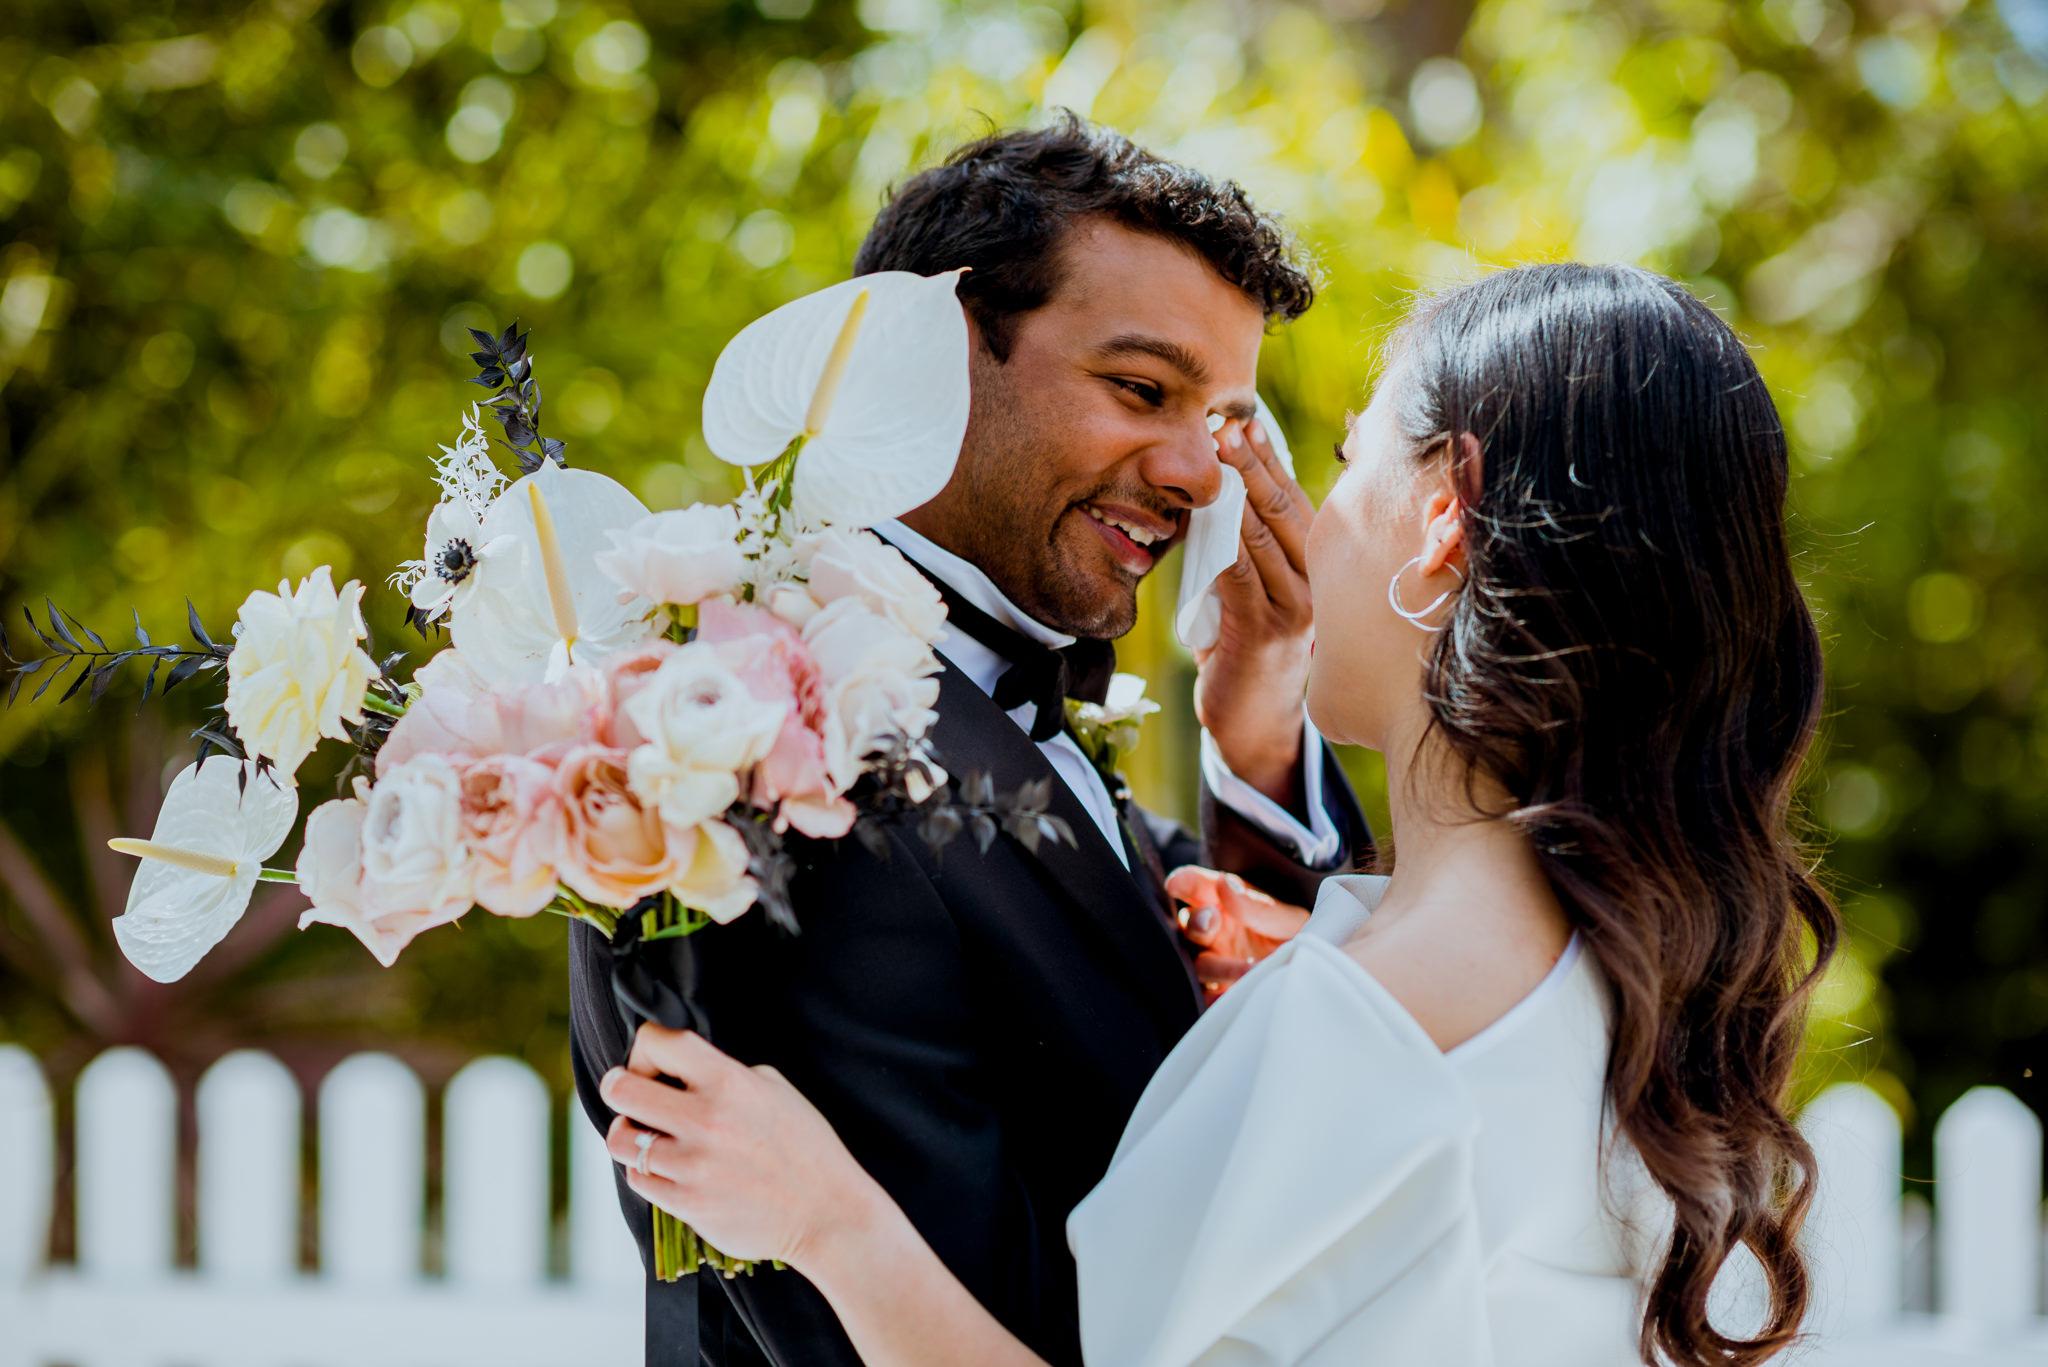 Groom wipes his tears as he talks to his bride